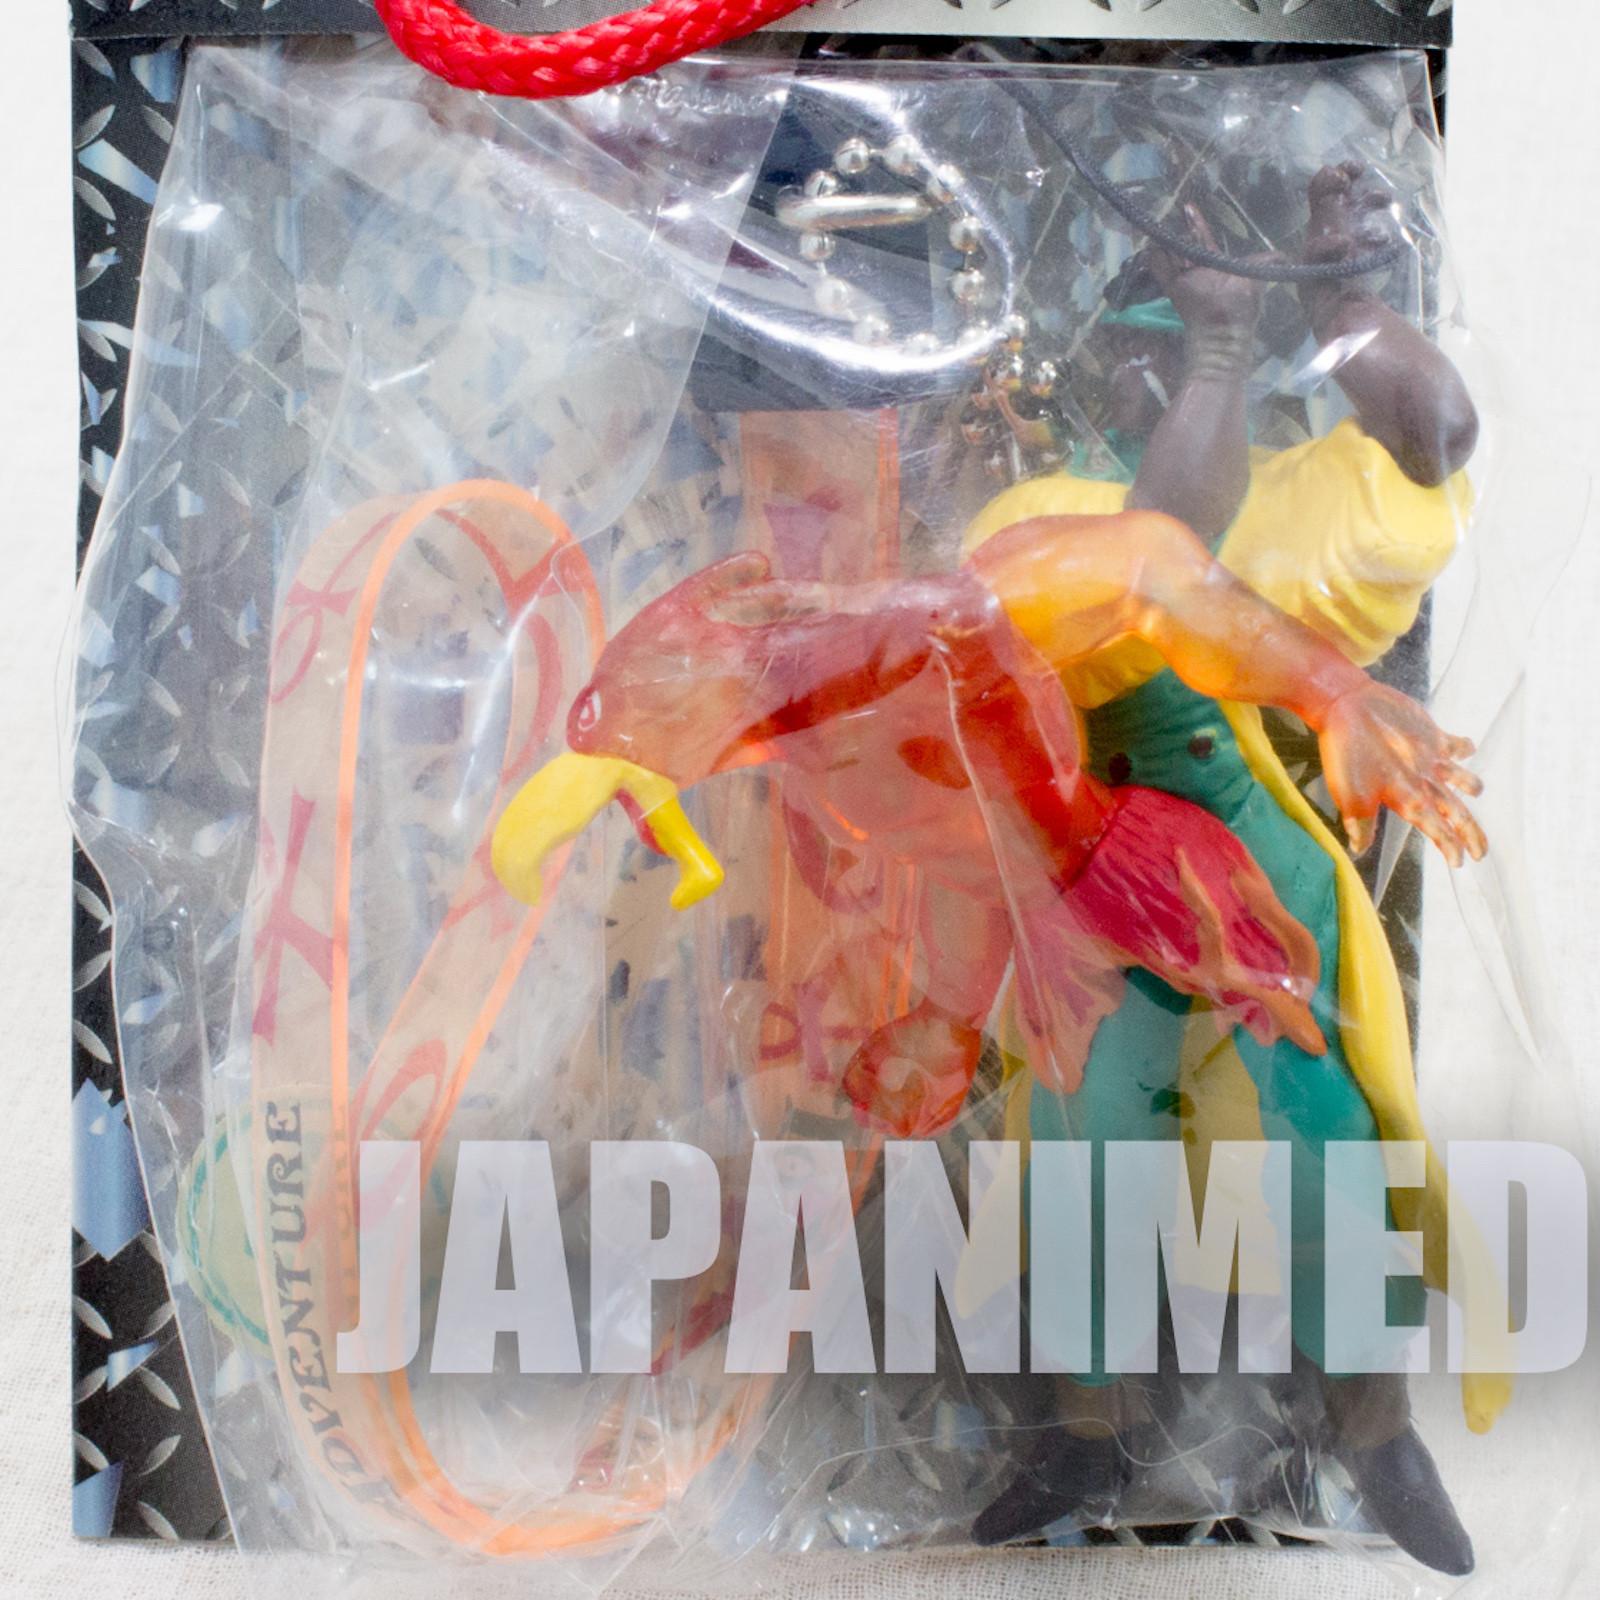 JoJo's Bizarre Adventure Muhammad Avdol Figure Strap JAPAN ANIME